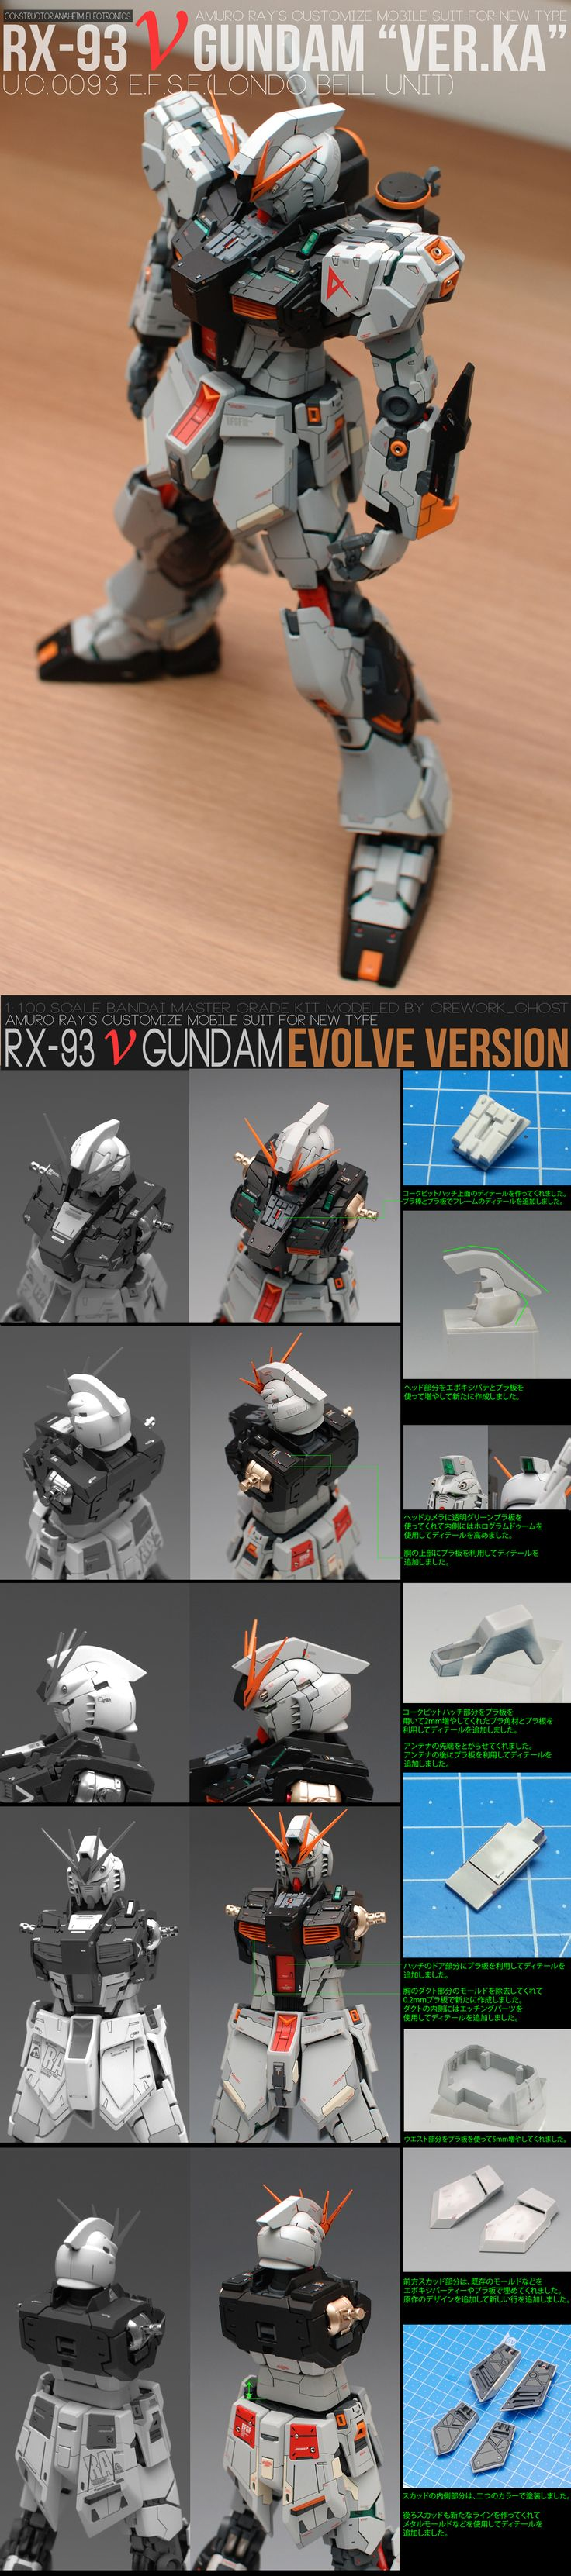 MG 1/100 RX-93 Nu Gundam Ver.Ka [EVOLVE Ver.]:  Remodeled by Grework_Ghost